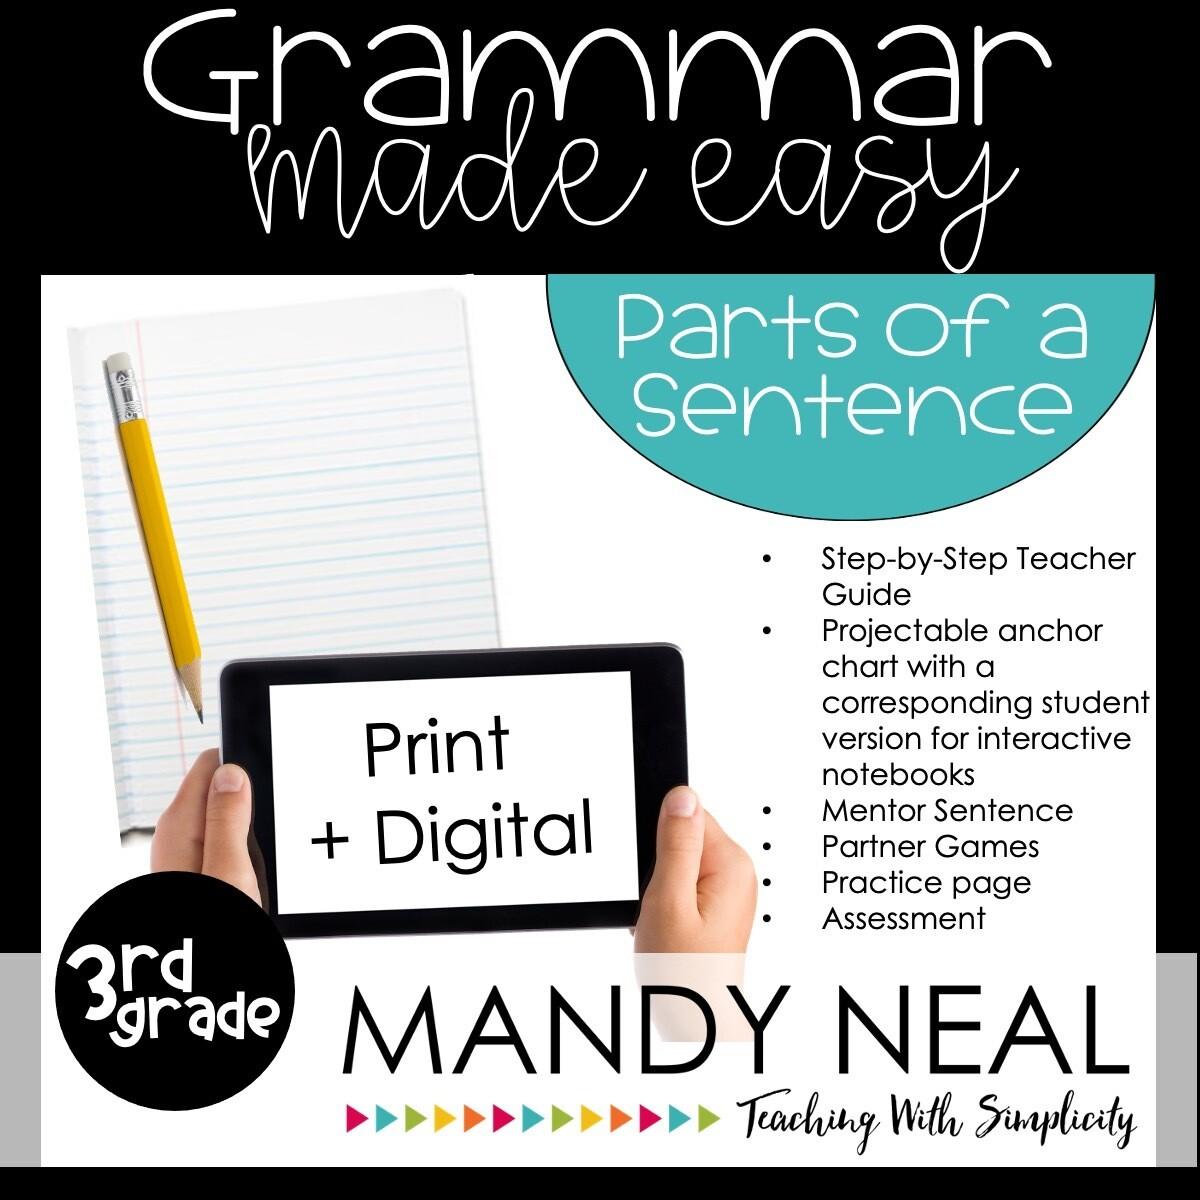 Print + Digital Third Grade Grammar Activities (Parts of a Sentence)